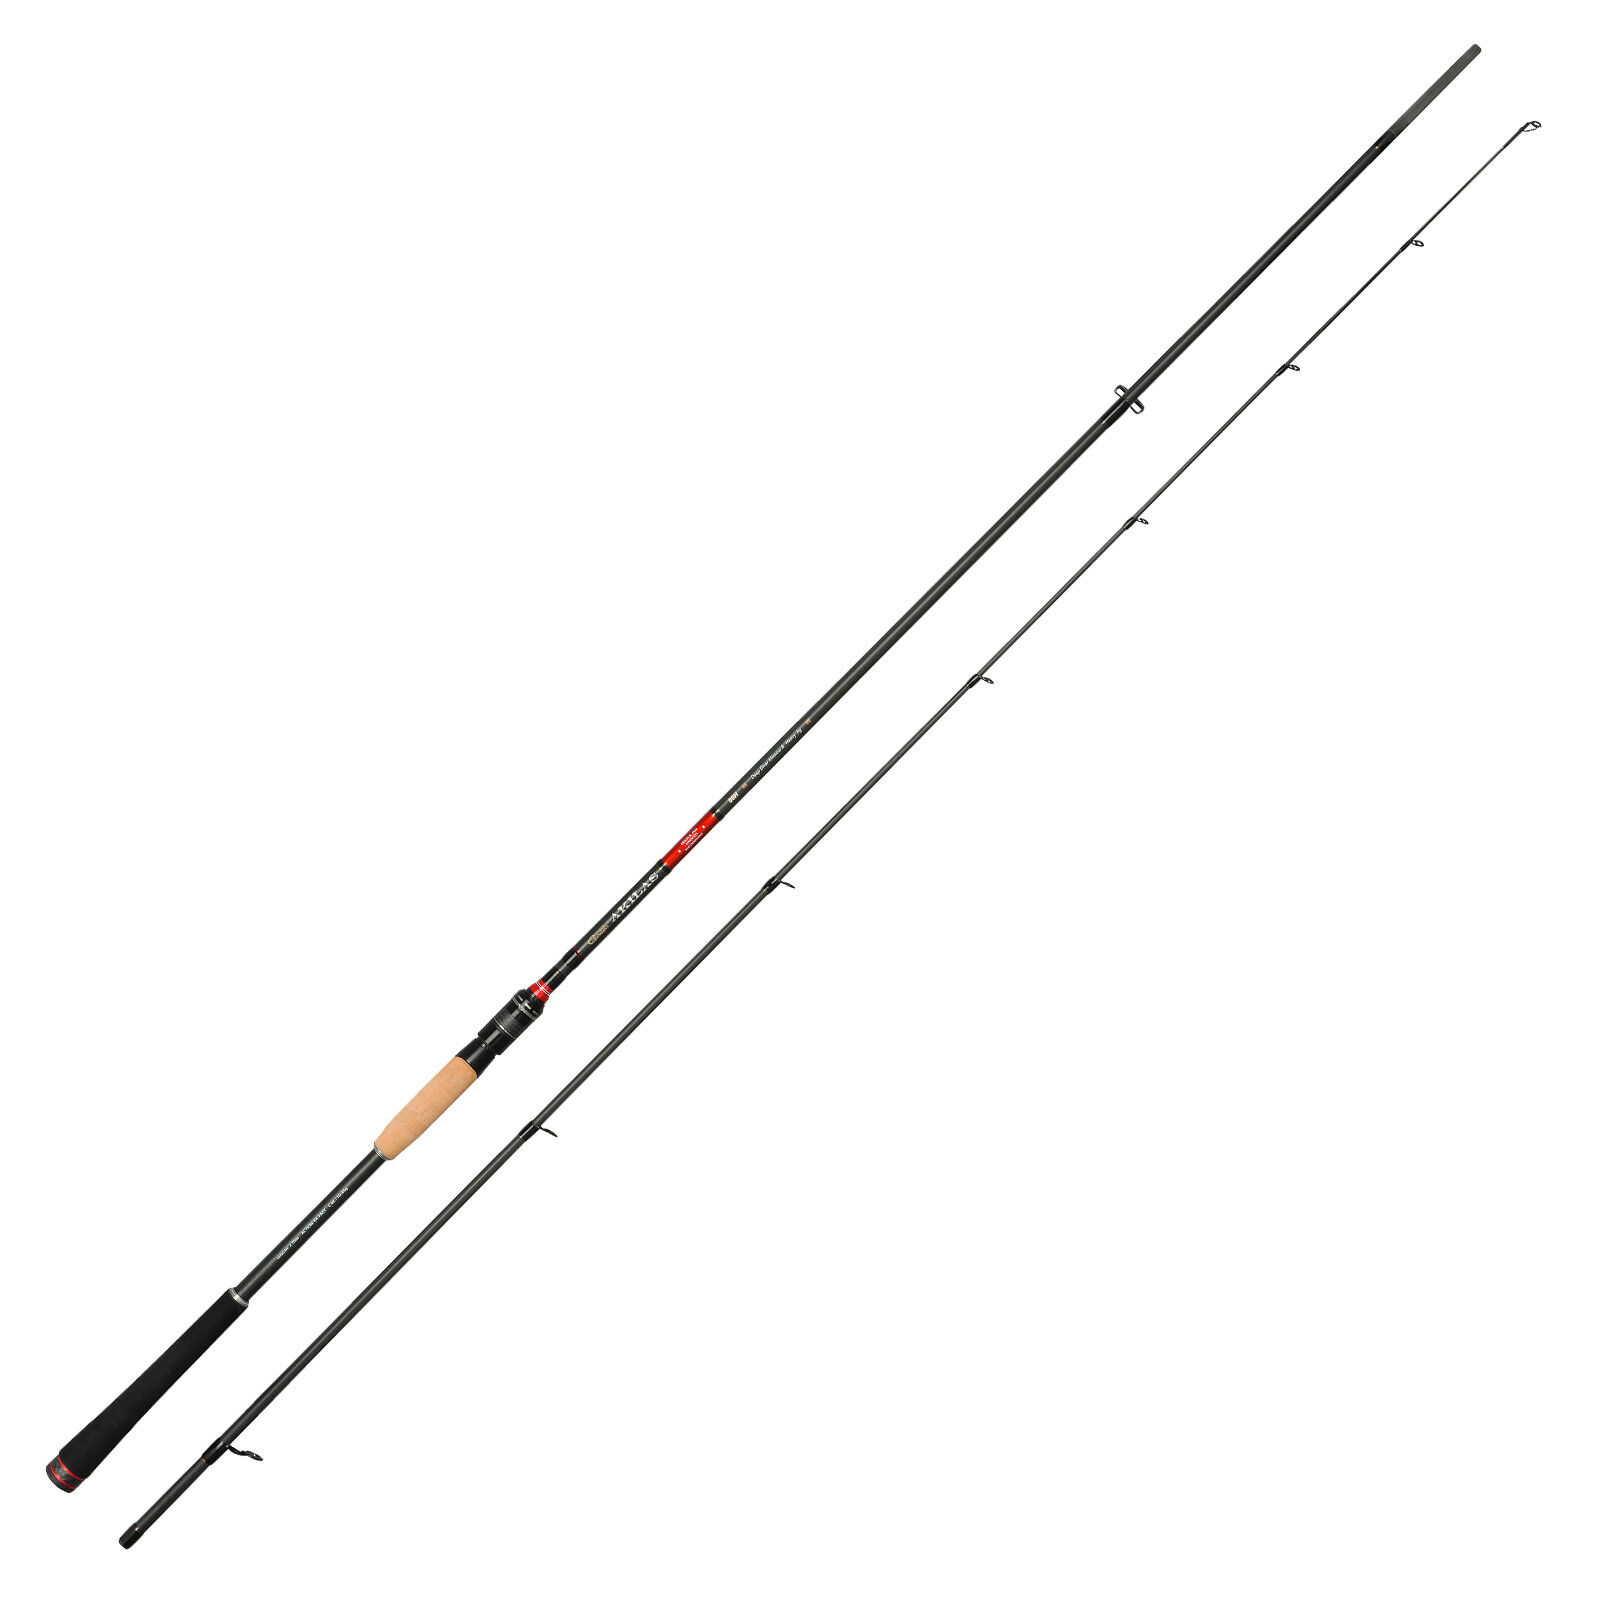 Cañas de GAMAKATSU Pro Spinning Rod - longitud Akilas 2018 90 H 2, 70 m WG 10-45 g